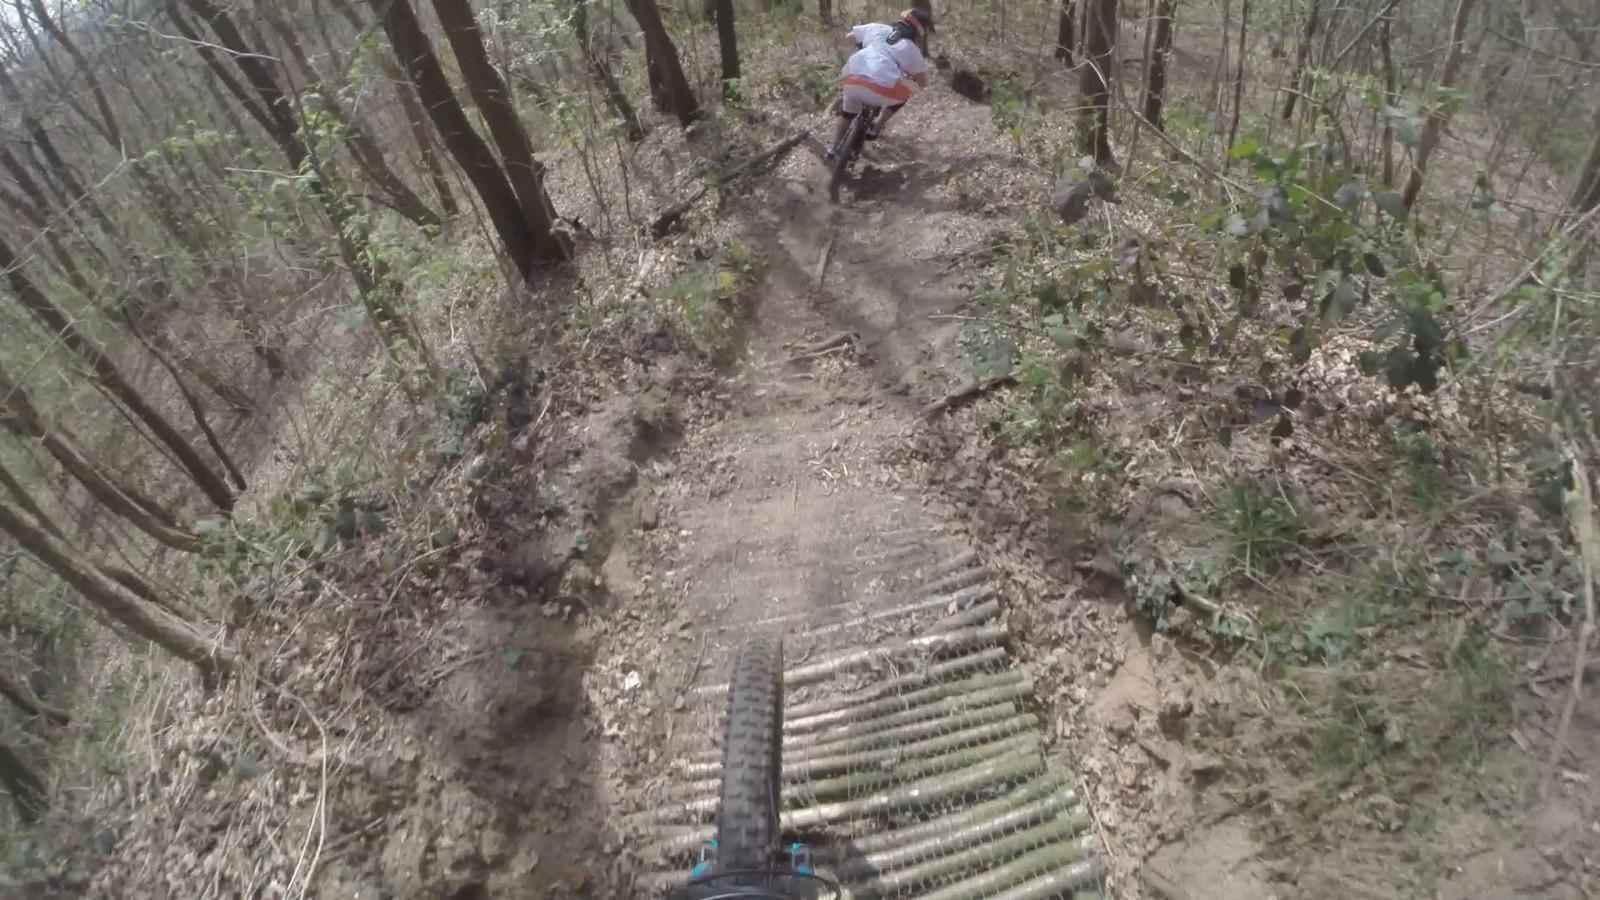 fr5 - dennis.leidelmeijer - Mountain Biking Pictures - Vital MTB